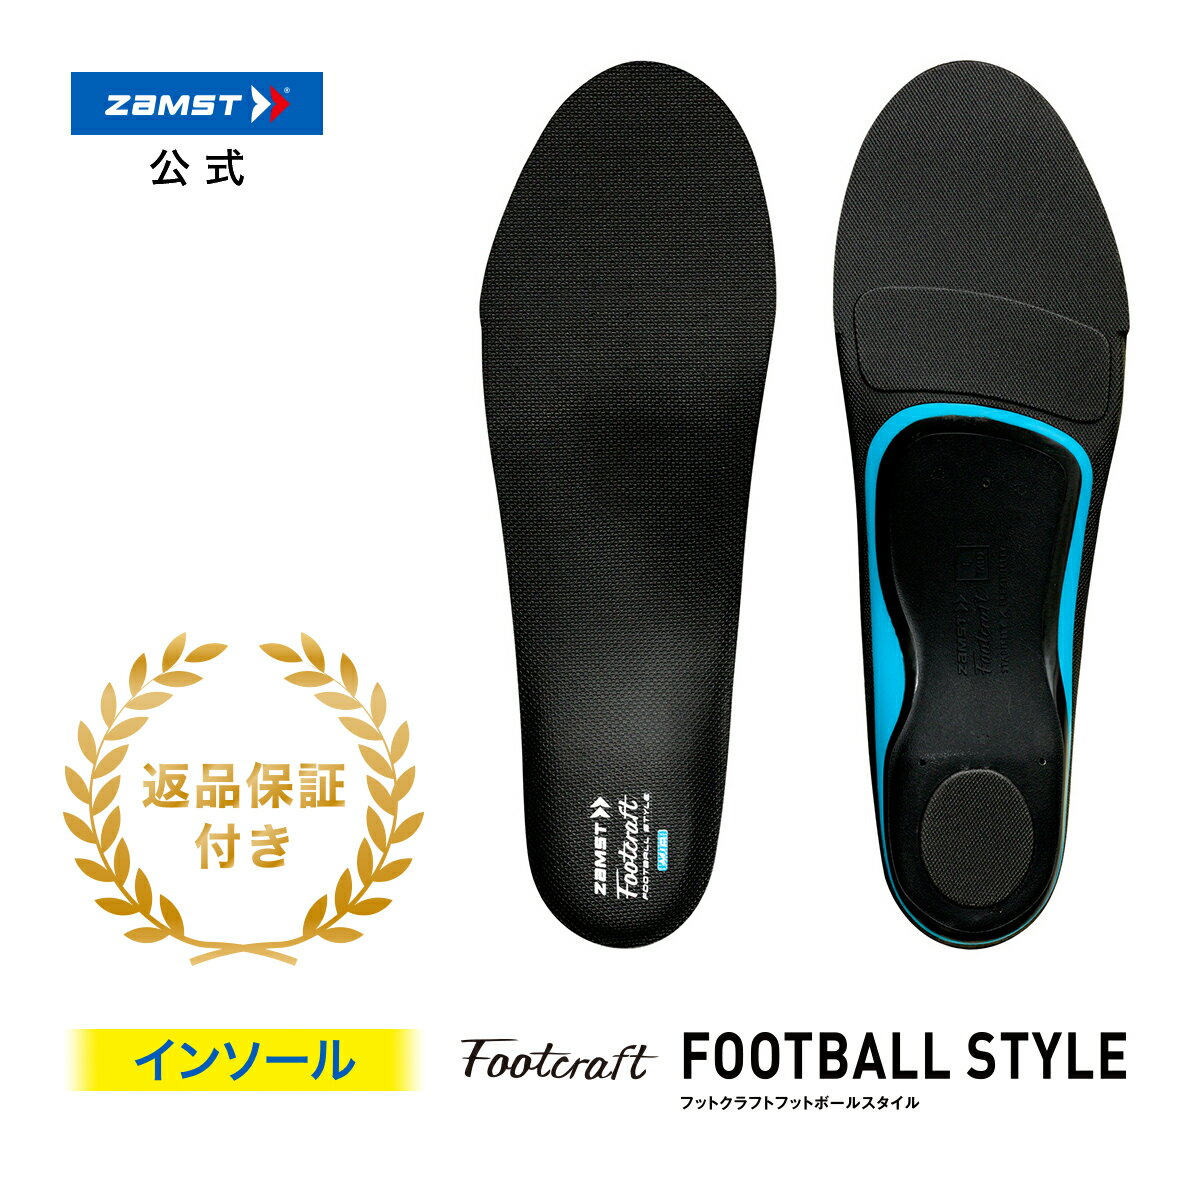 Footcraft FOOTBALL STYLE